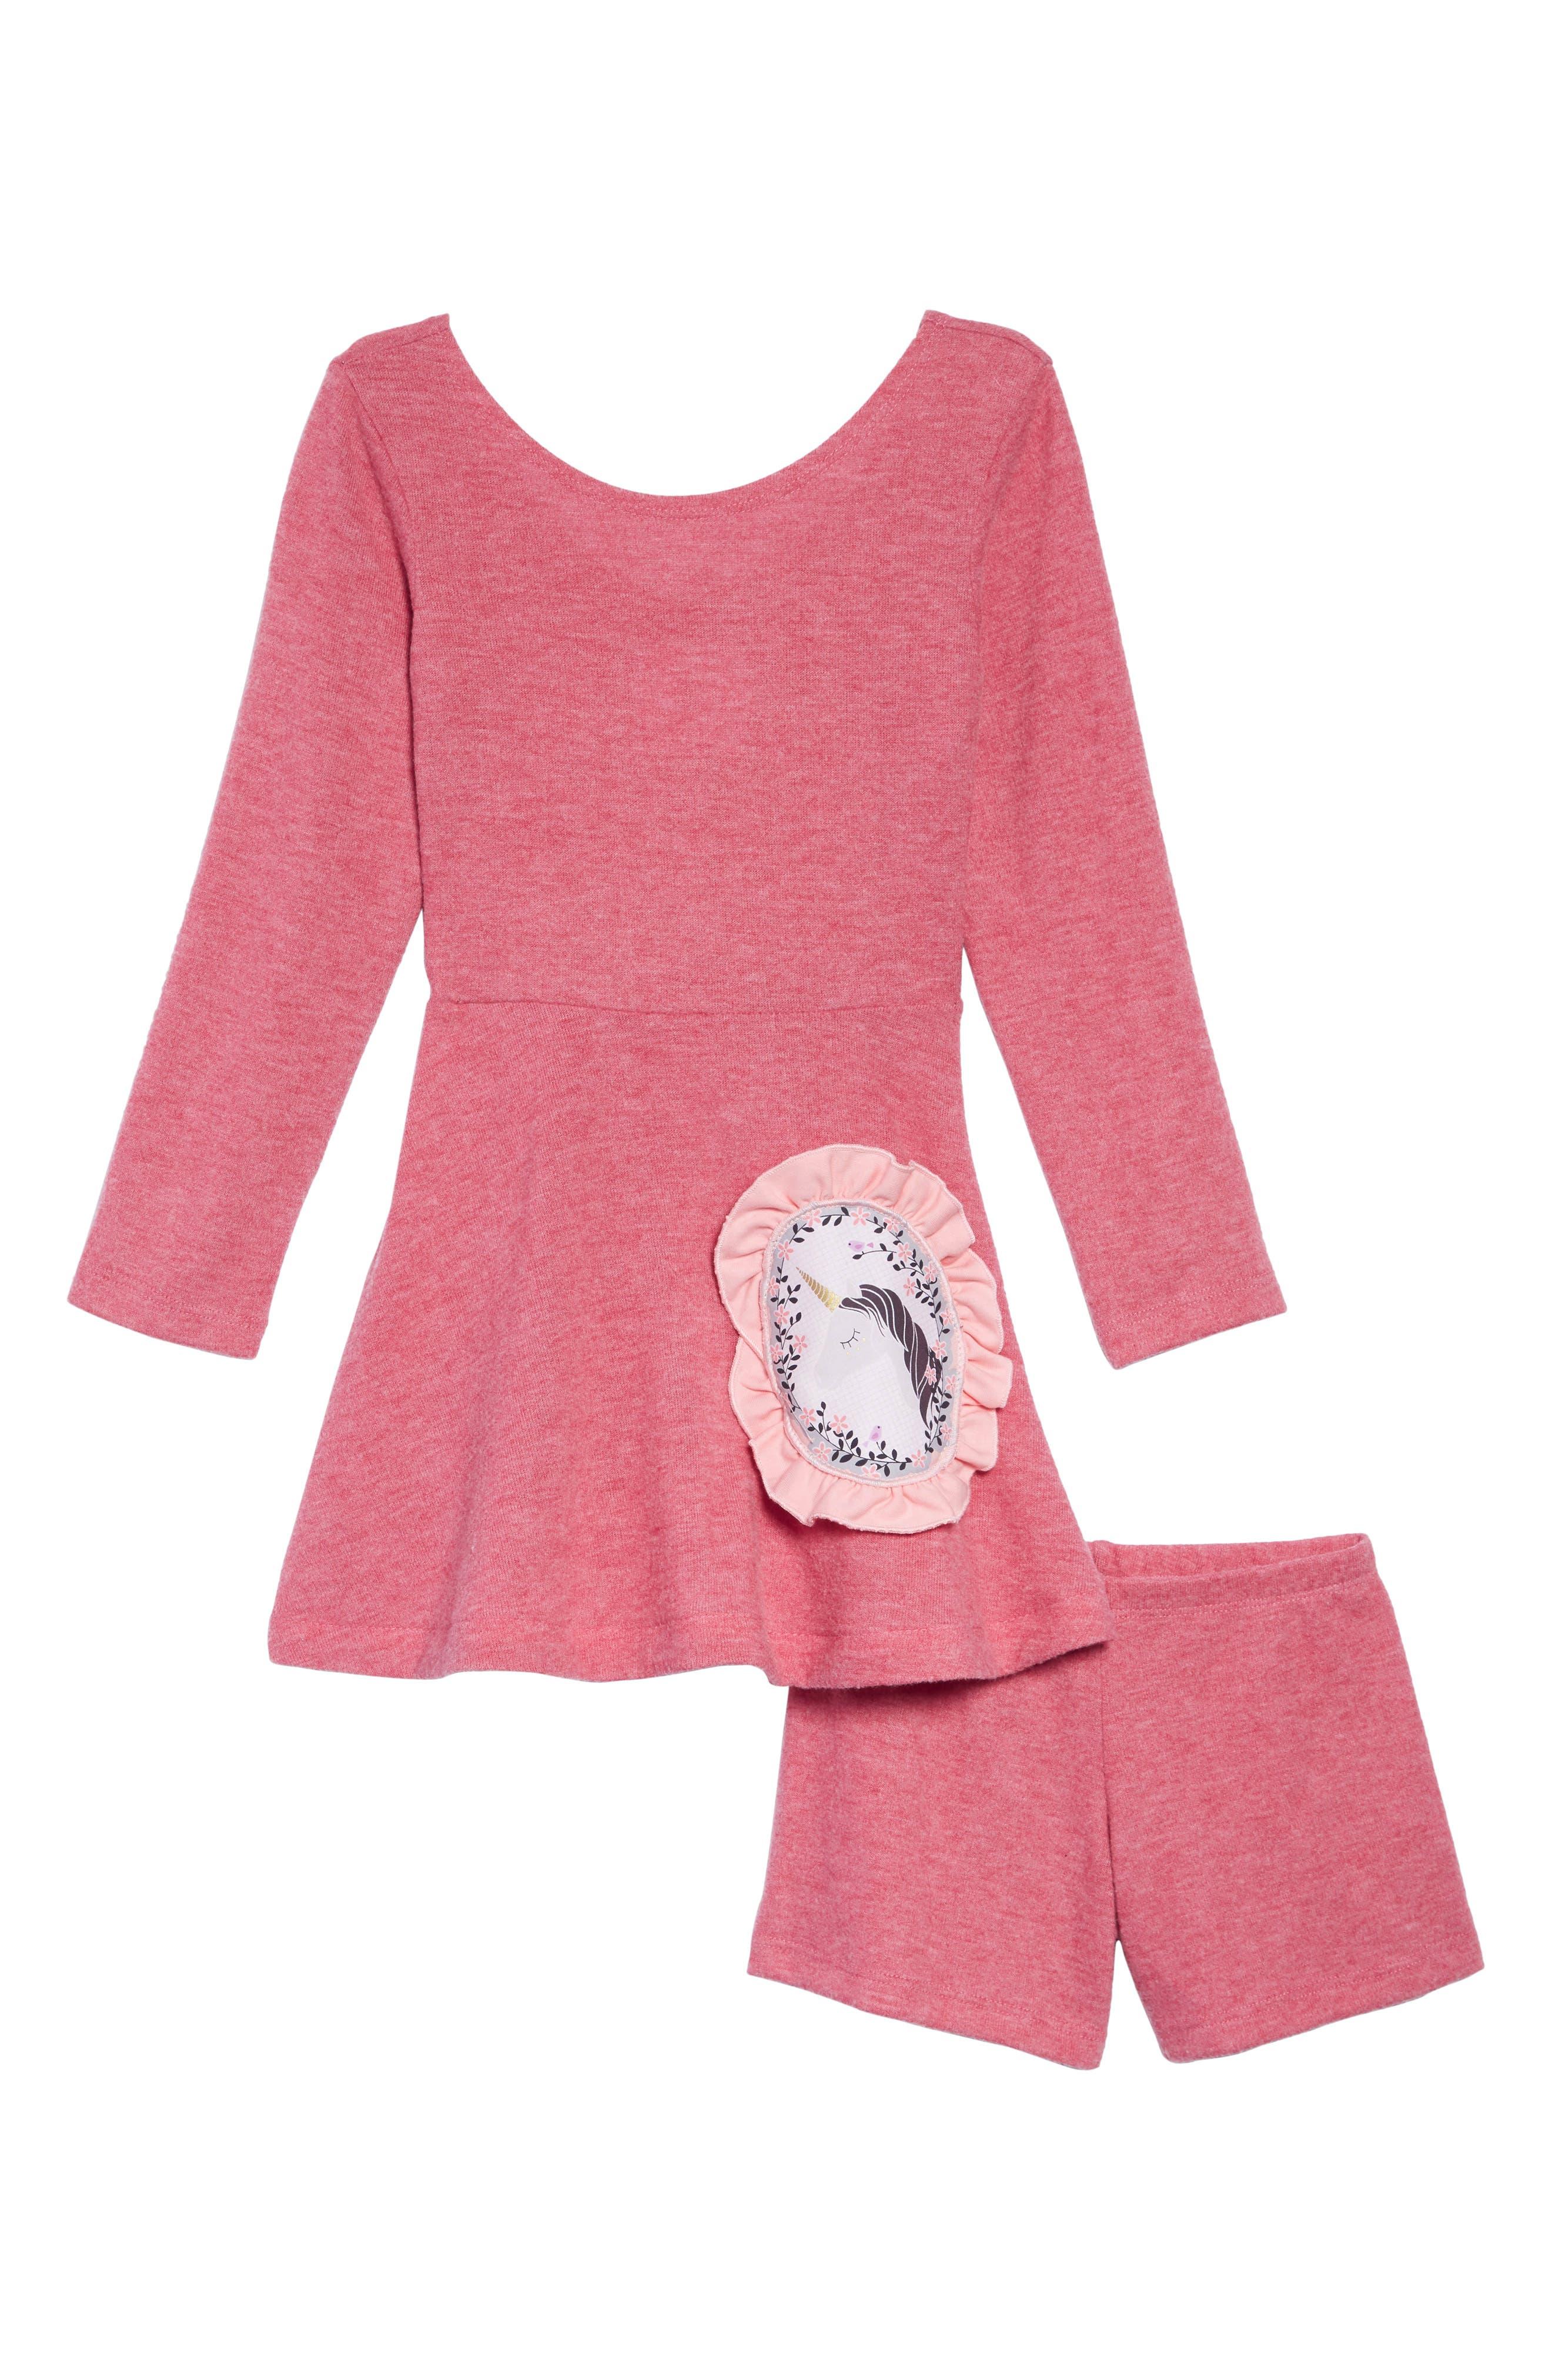 FIVELOAVES TWOFISH,                             Knit Skater Dress,                             Main thumbnail 1, color,                             650